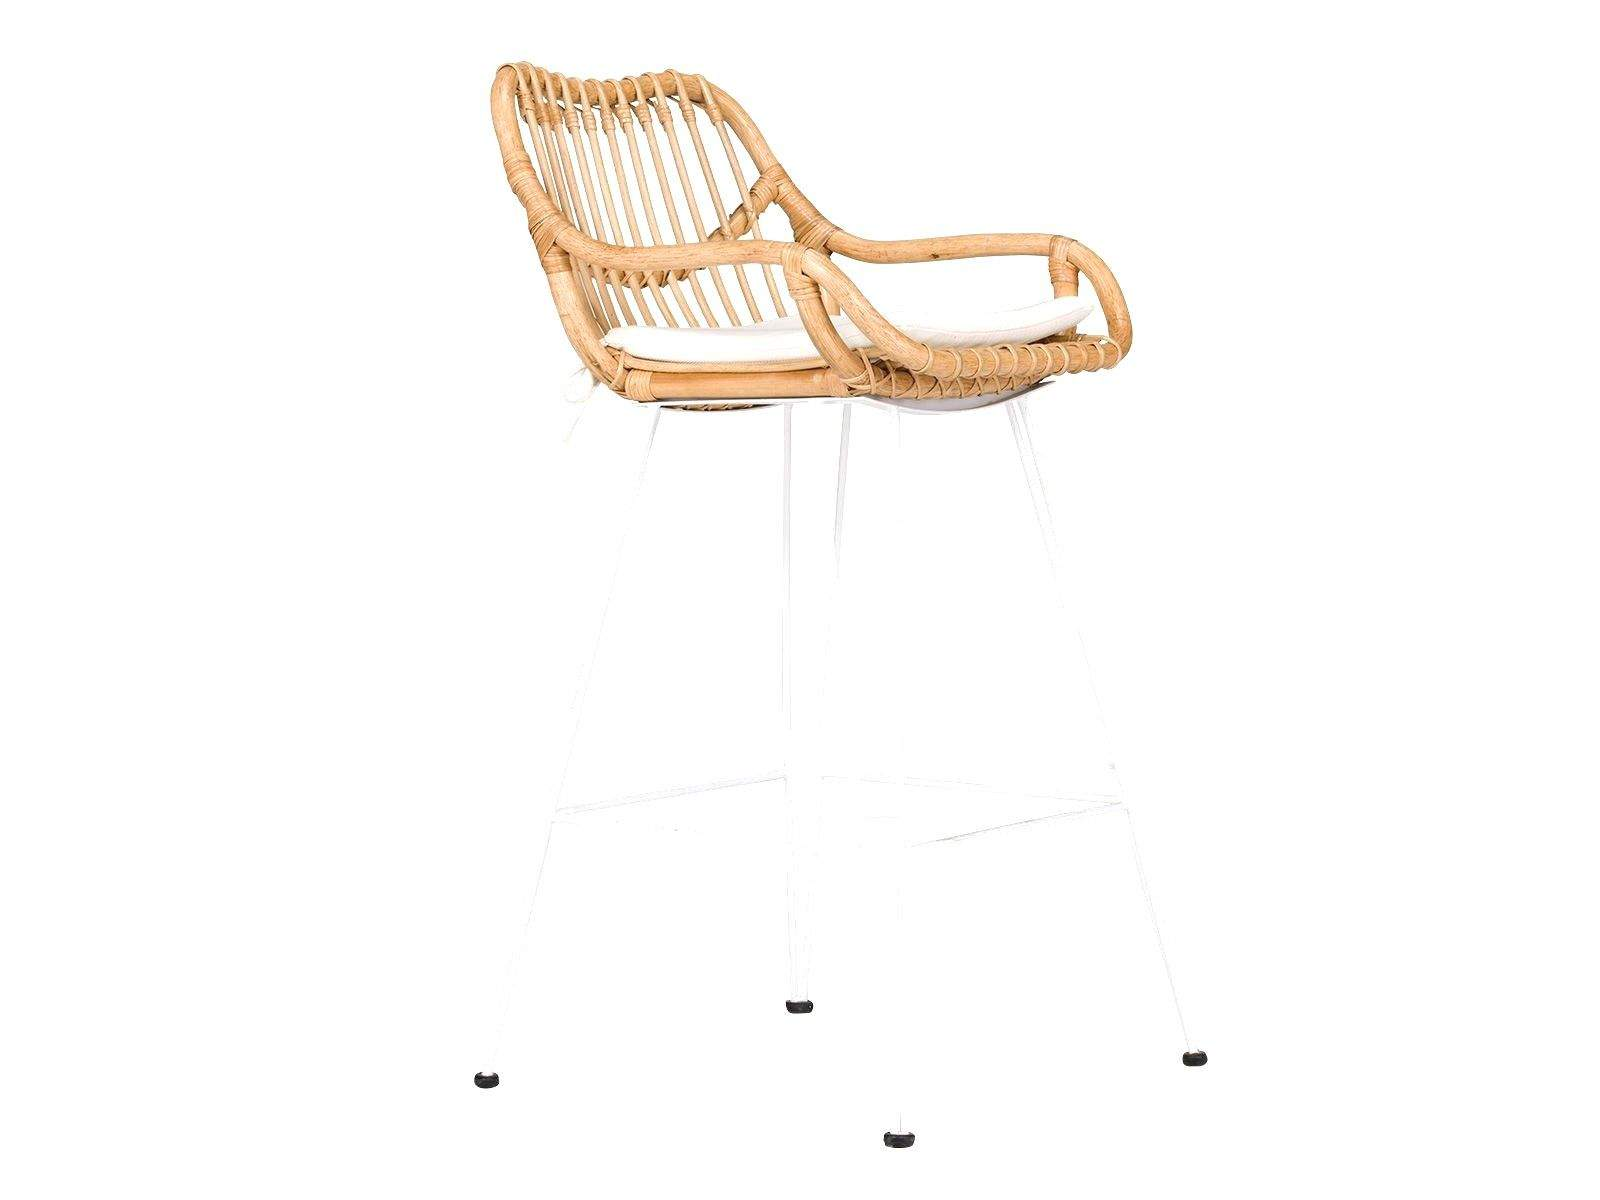 stuhl holz metall stuhl schwarz metall eindeutig dr no stuhl elegant bmw x5 3 0d elegant